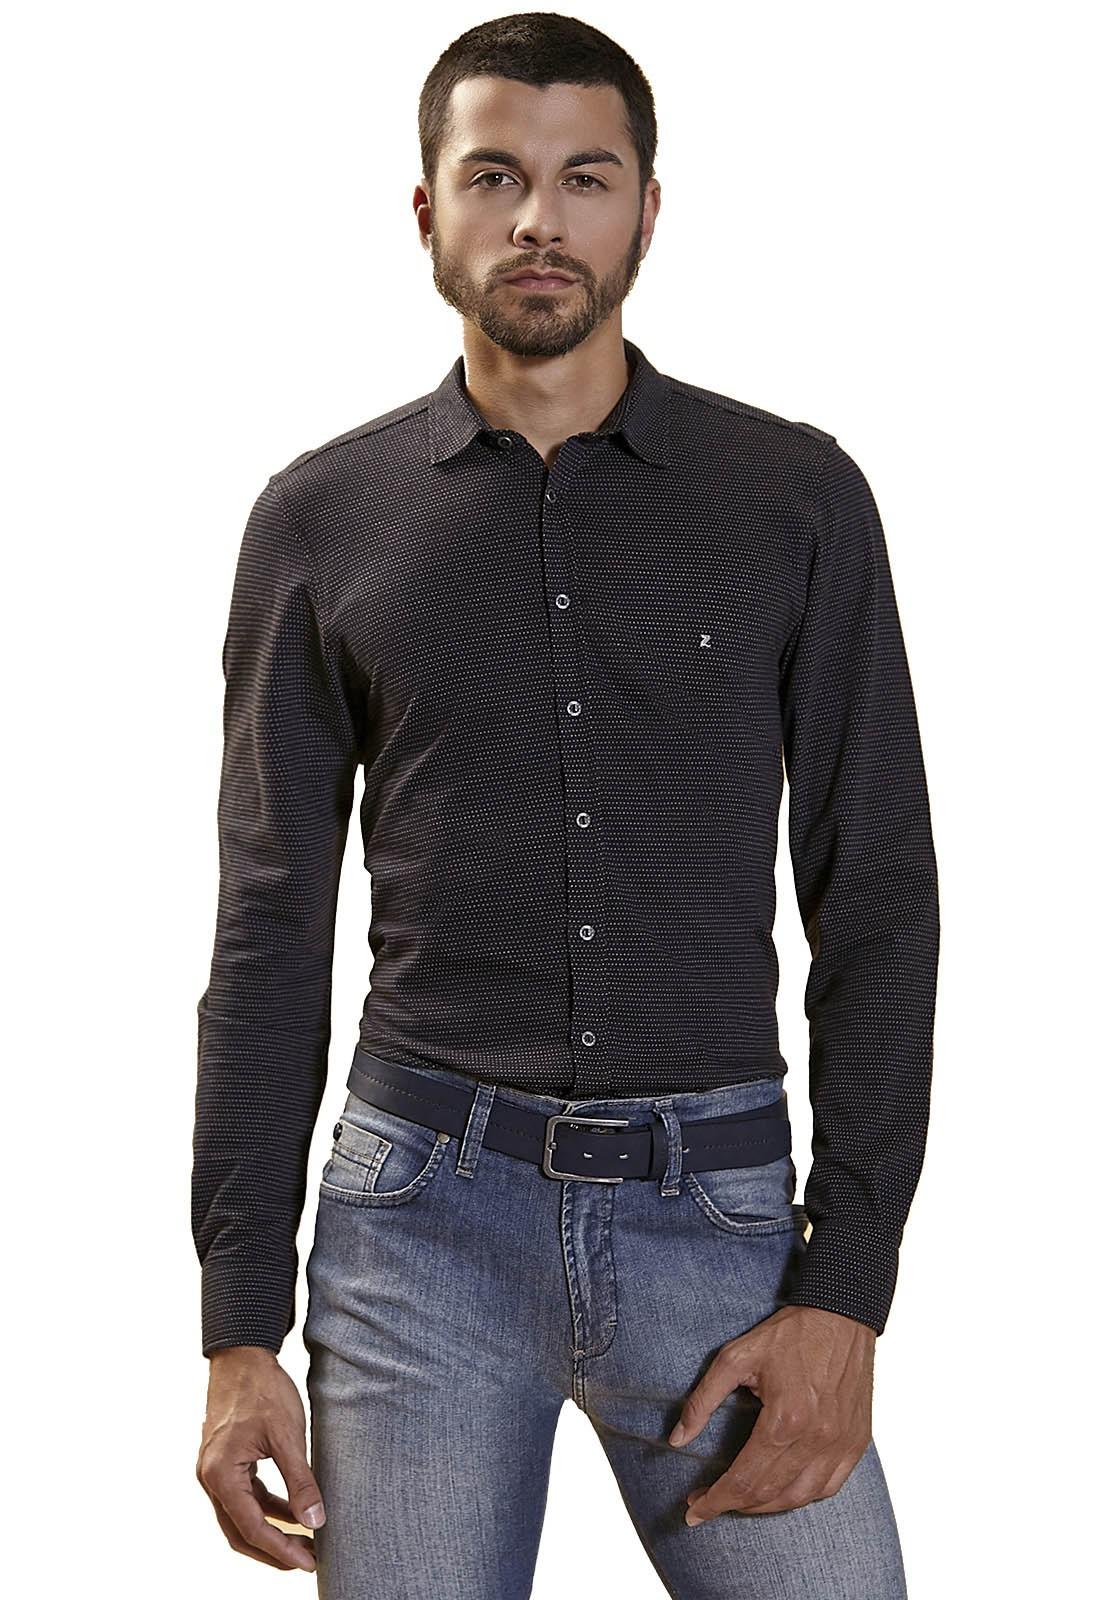 Camisa Fit Zaiko Malhla Estampada Poa Manga Longa 2252 Preto